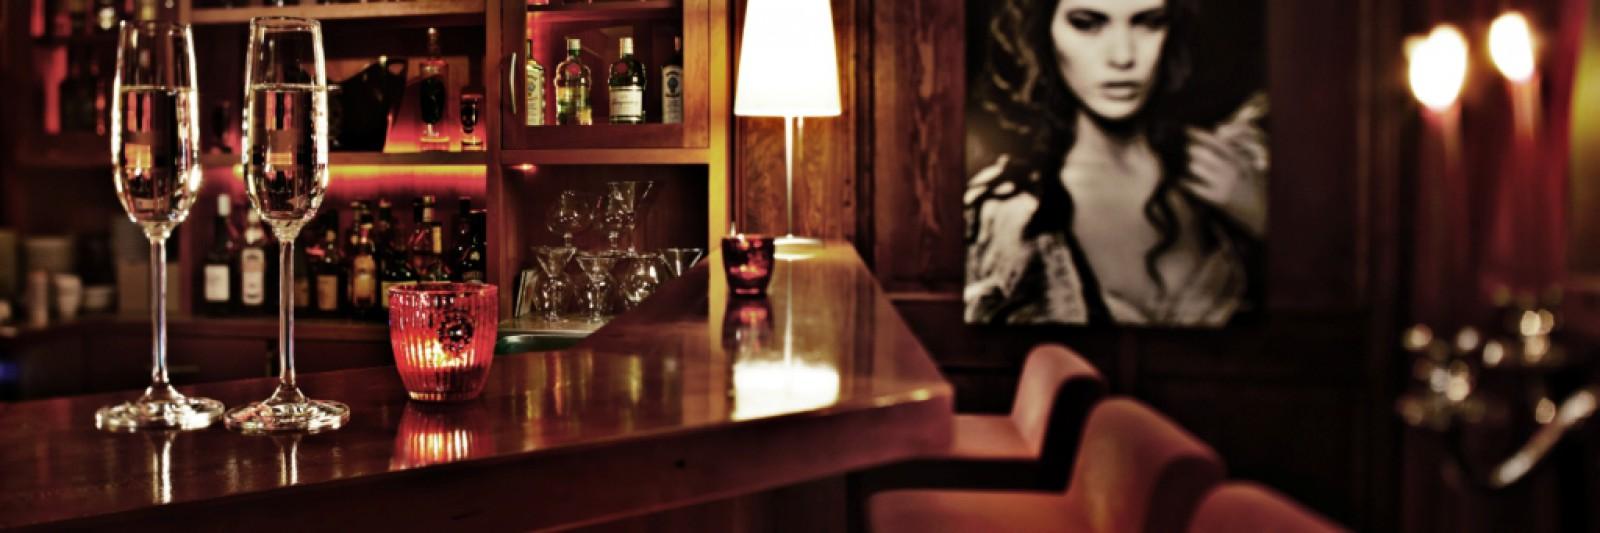 Restaurant Berghotel Lothar Mai Haus in Hofbieber Steens